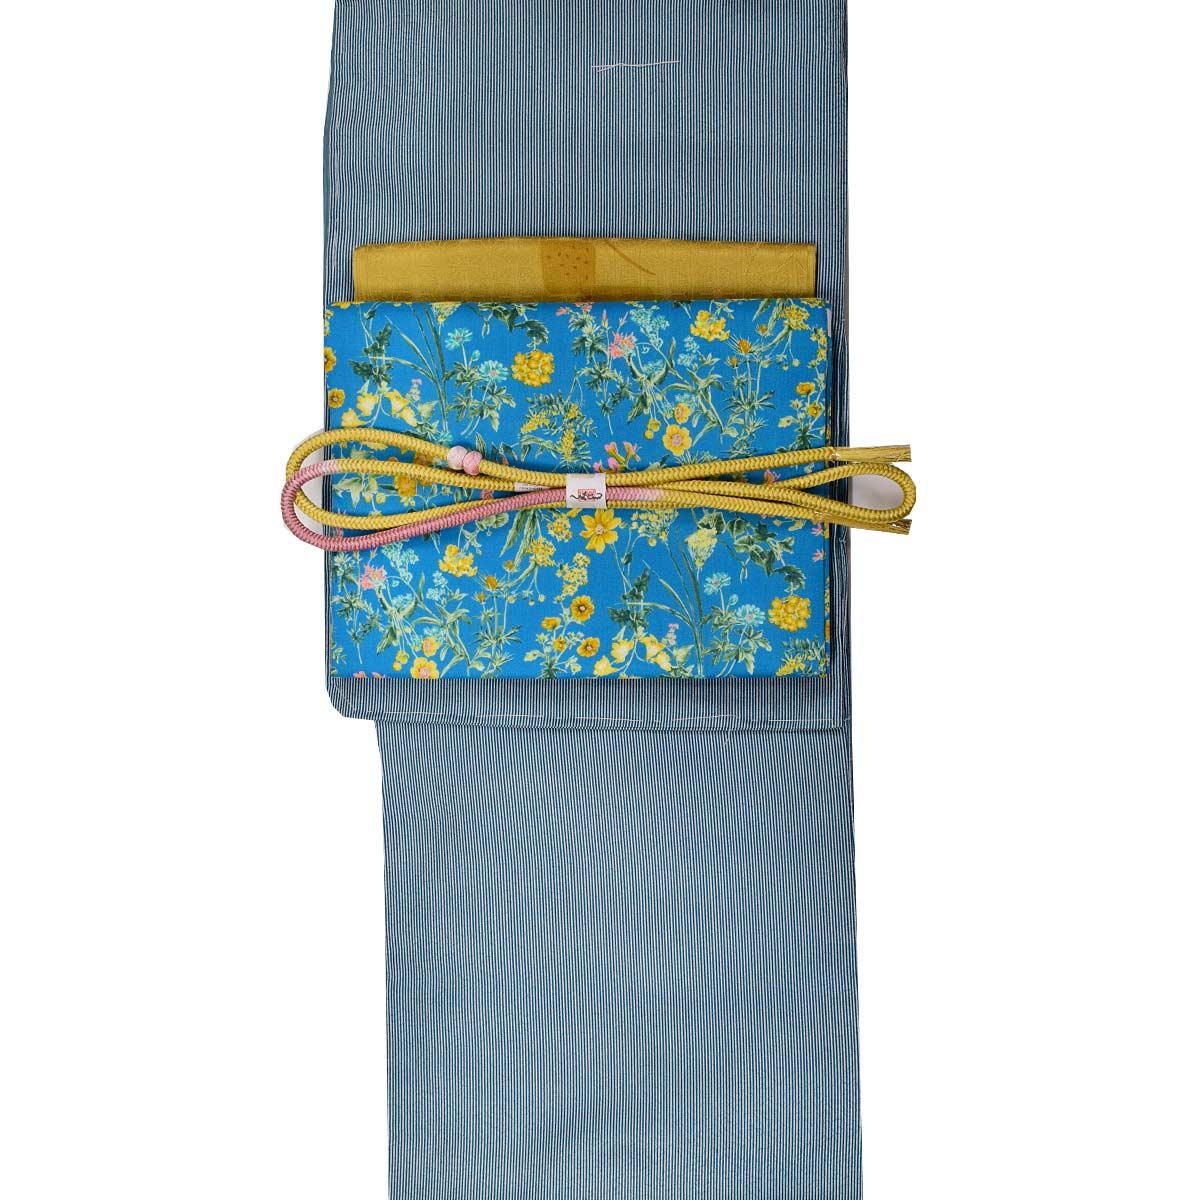 【L寸】洗える 袷 着物セット【4点】【ヒロミチナカノ】洗える袷着物+洗える八寸名古屋帯+正絹帯揚げ+正絹帯締め 着物 和装 和服番号d808-42